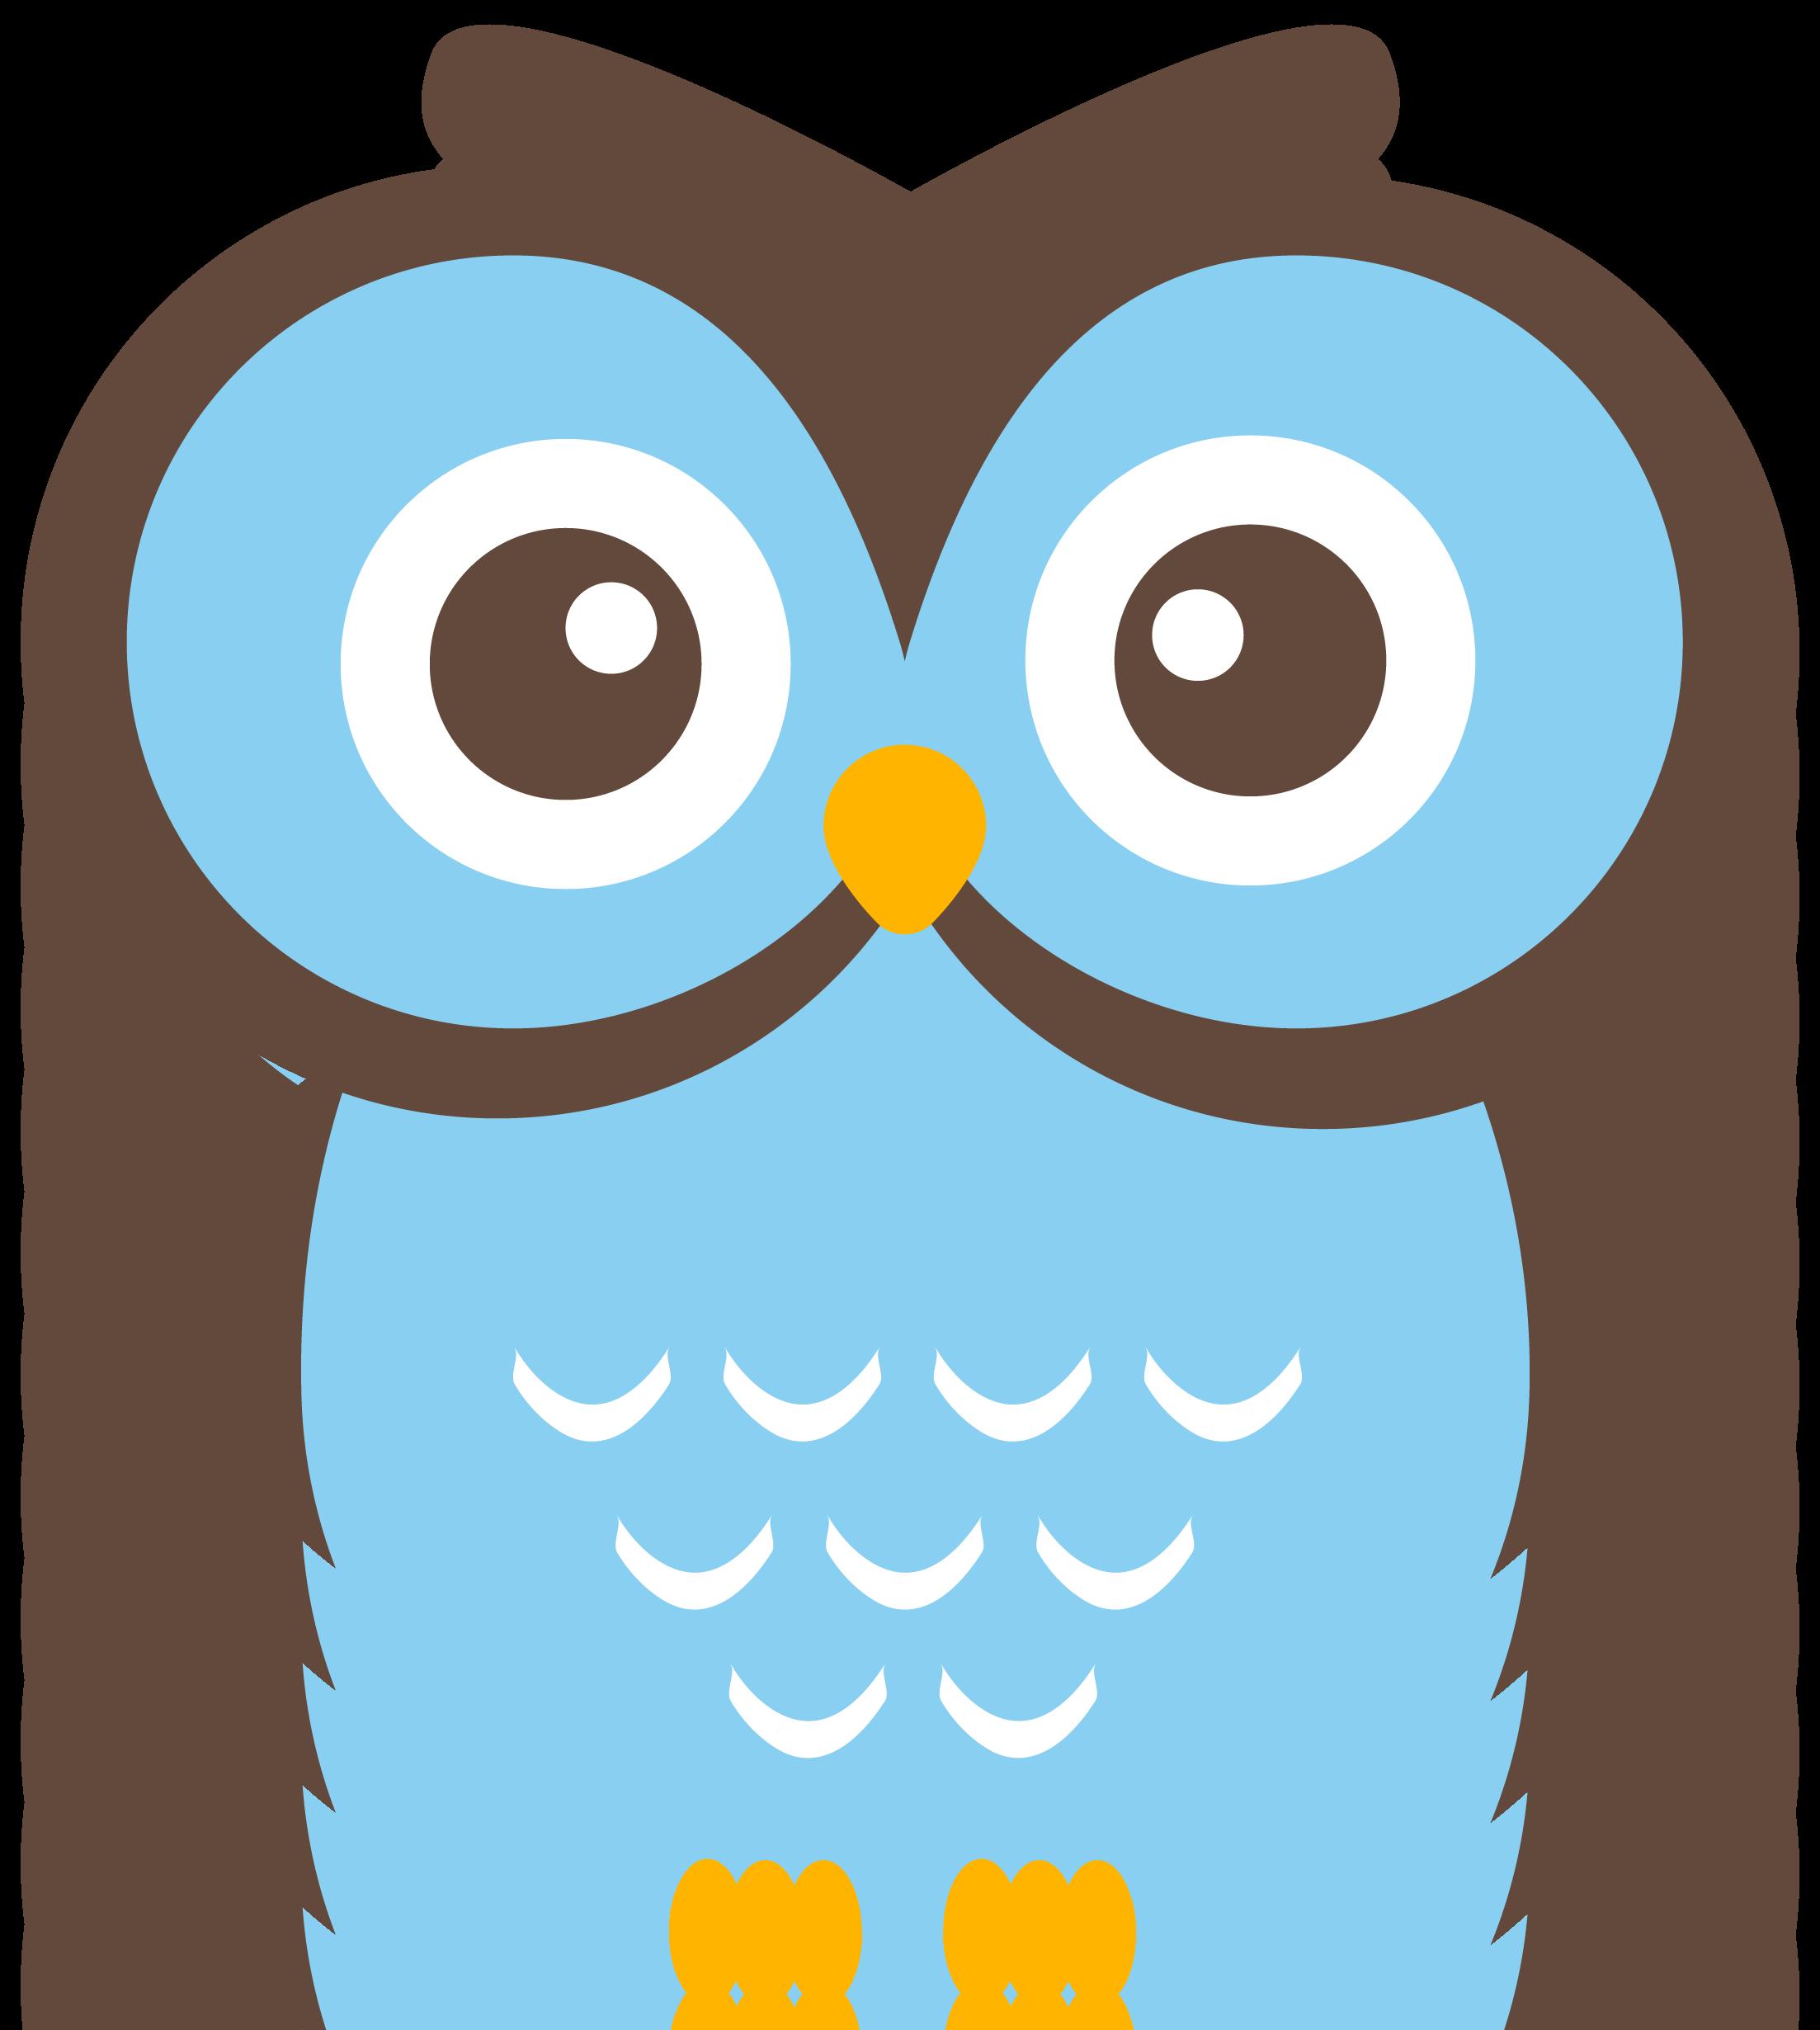 Blue Owl Clipart #1 .-Blue Owl Clipart #1 .-5